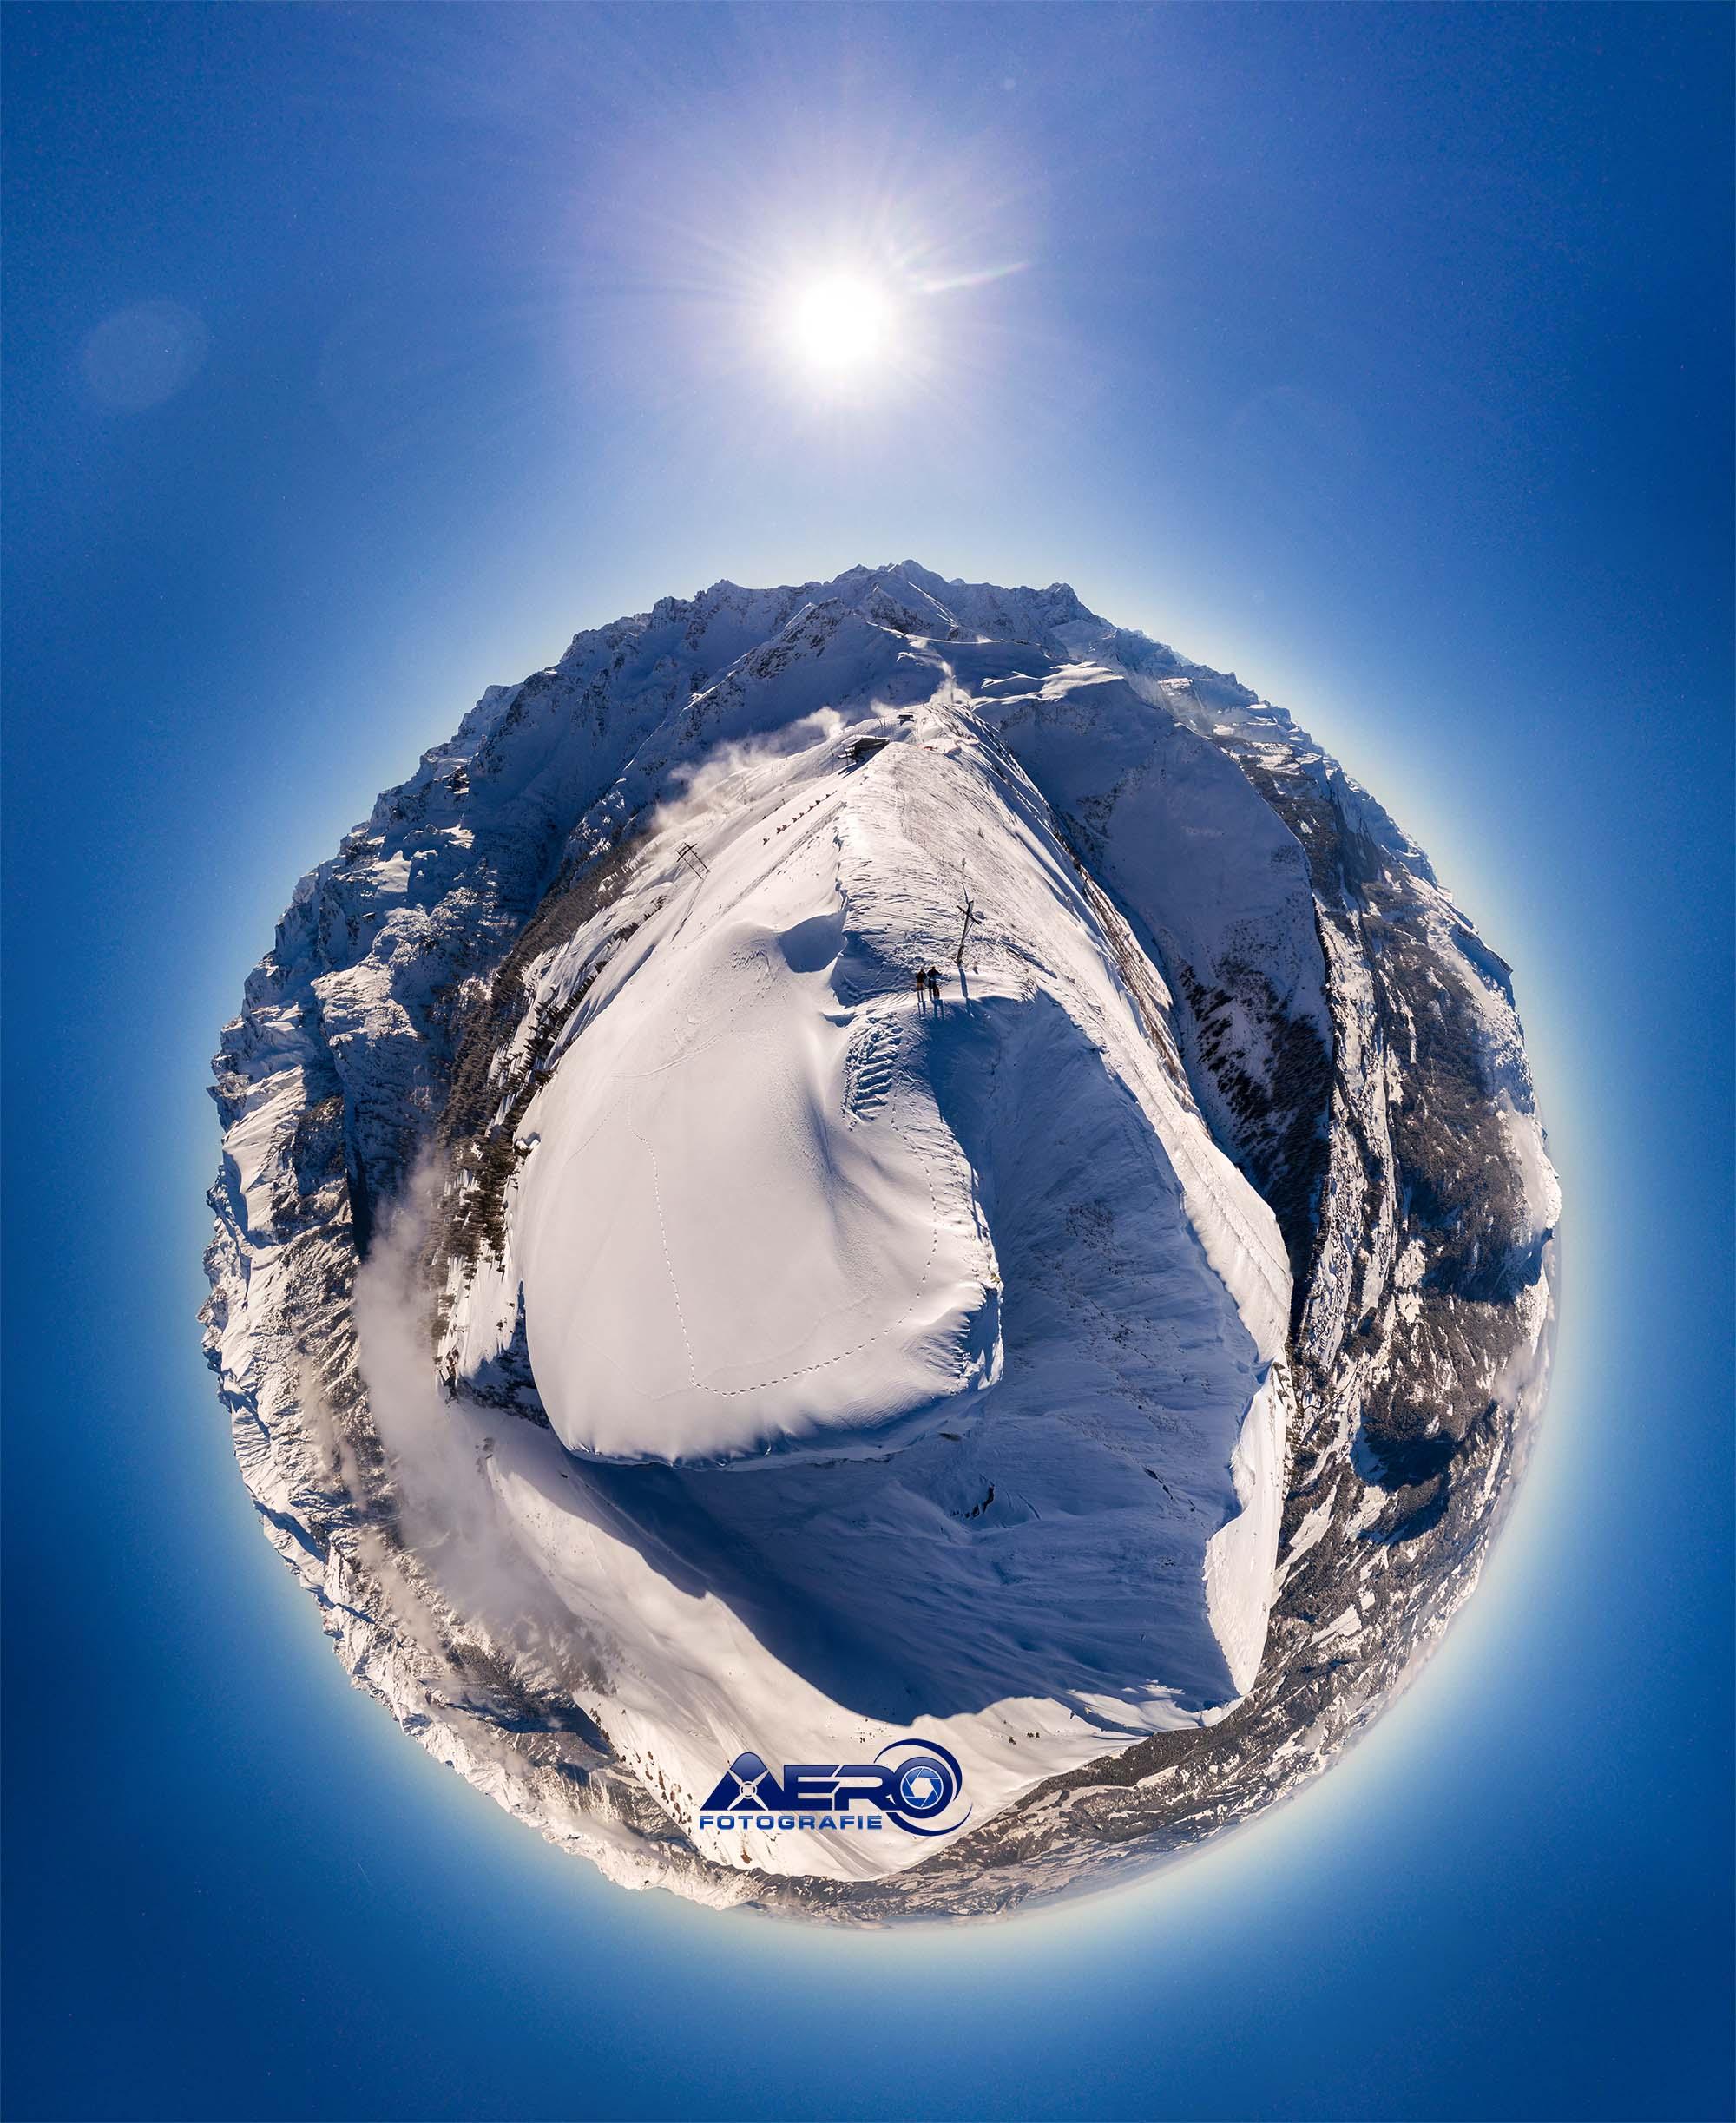 Fellhorn Winter Panorama